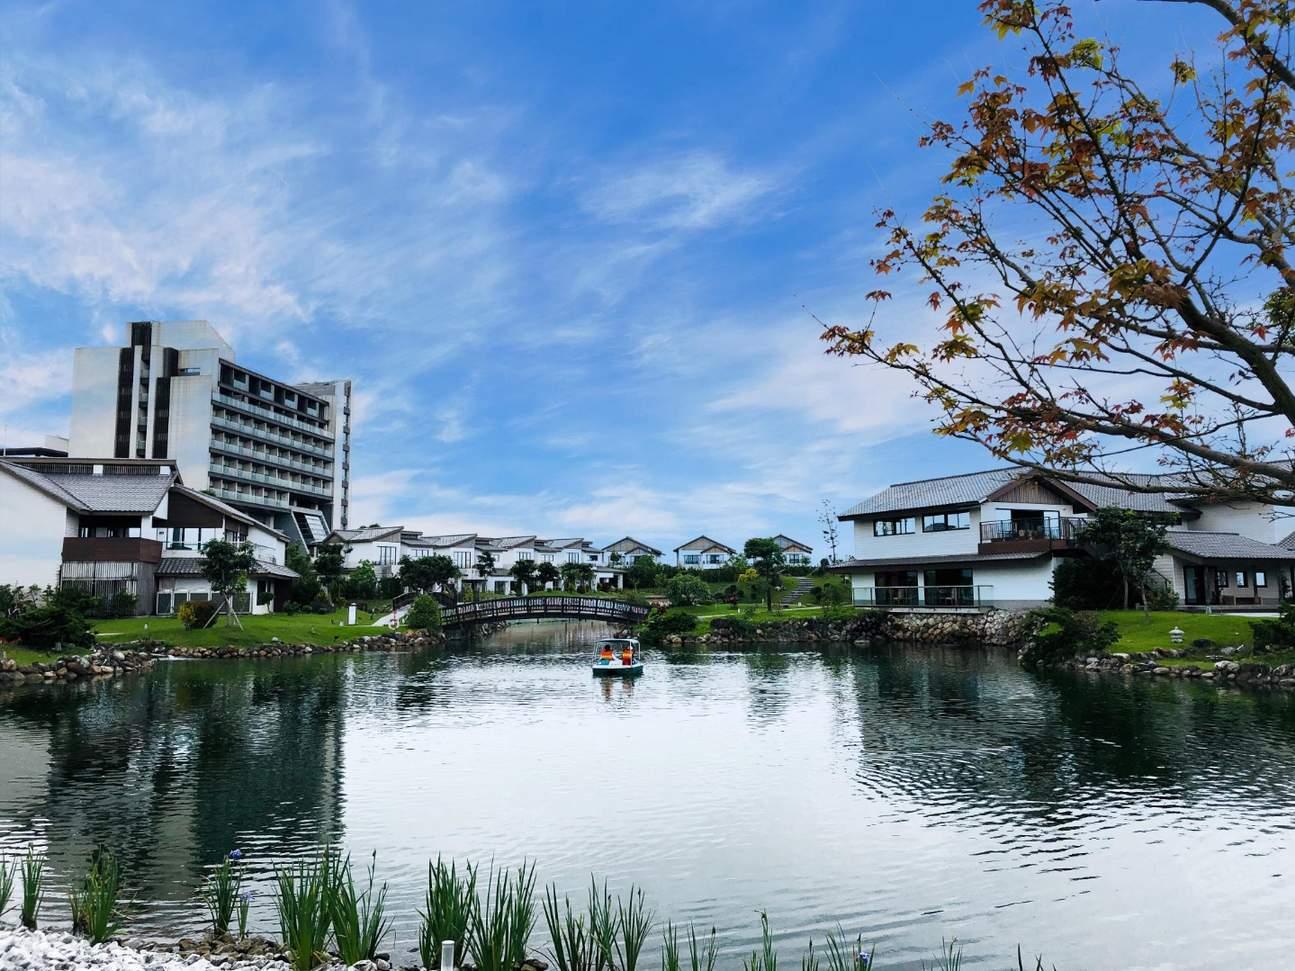 Dancewoods Yilan is a Japanese garden-themed resort